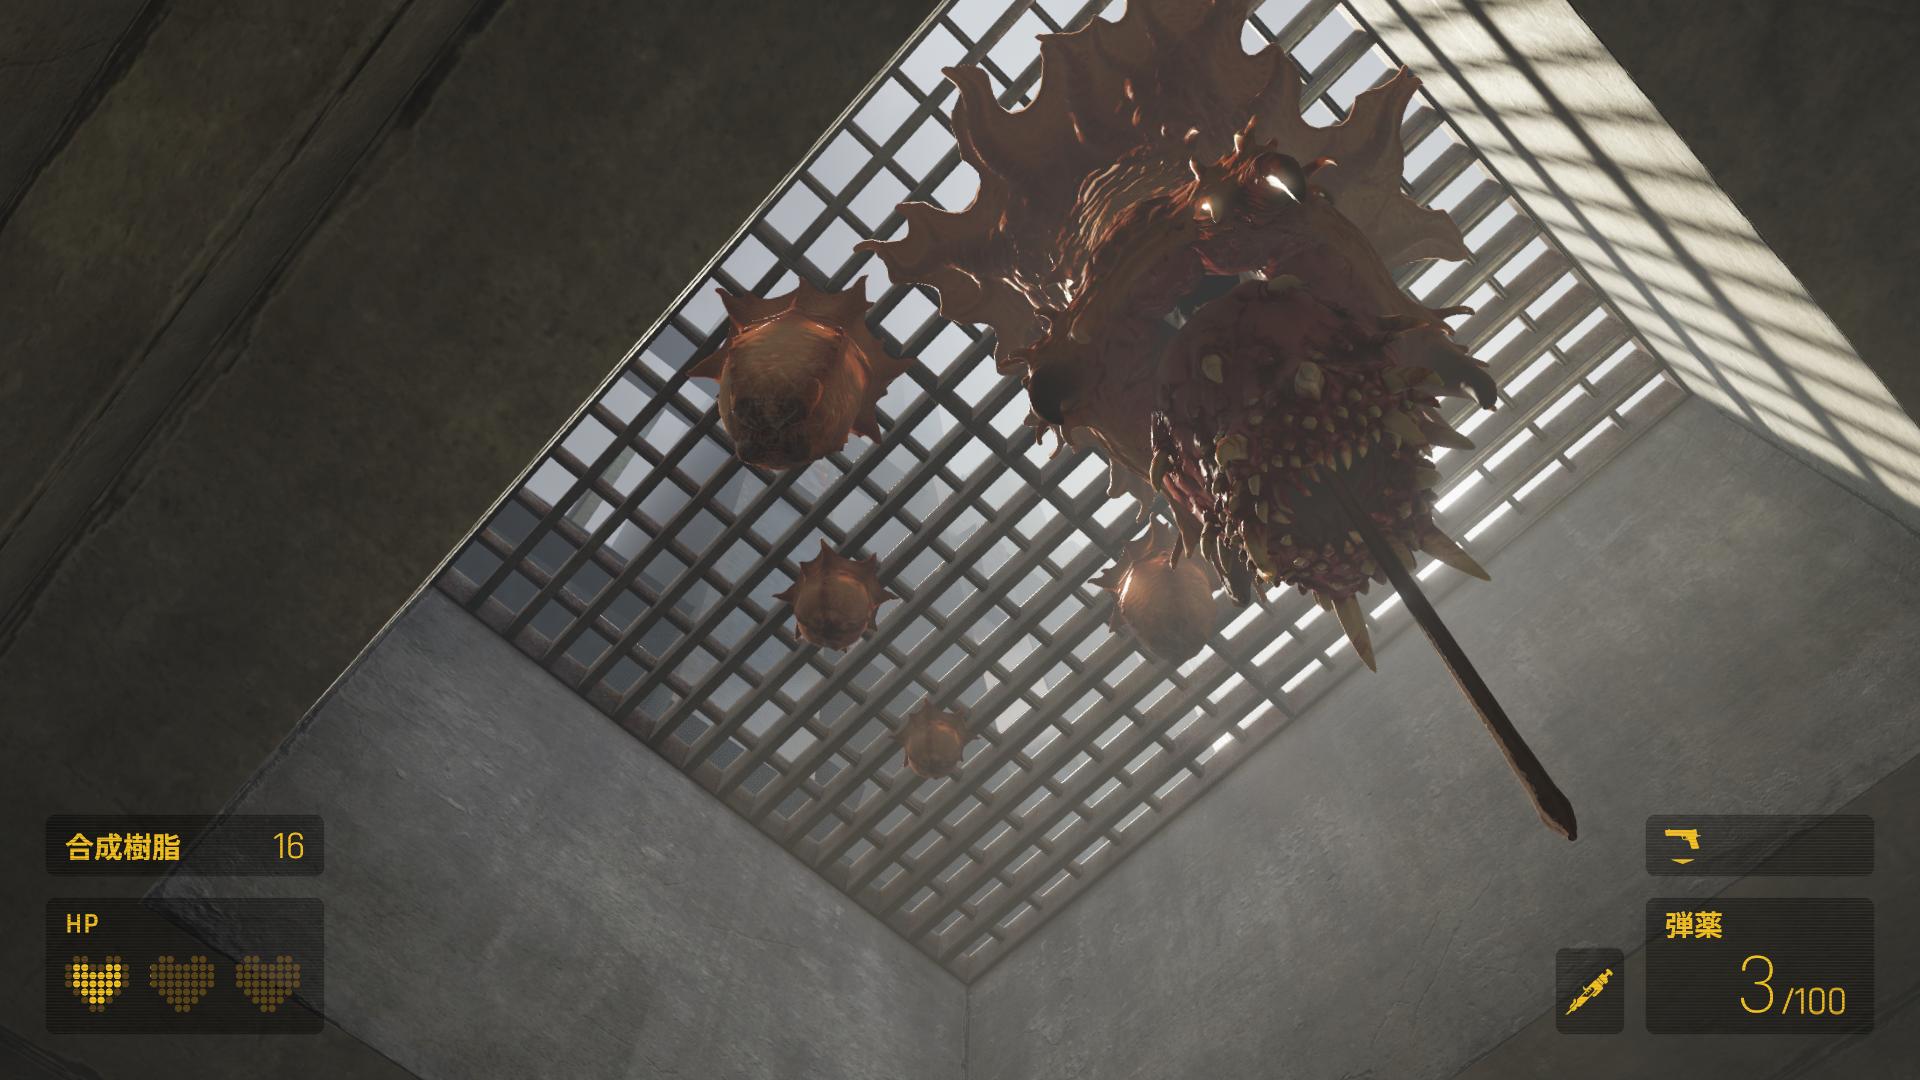 【Half-Life Alyx】はゾンビゲーム?怖いの?